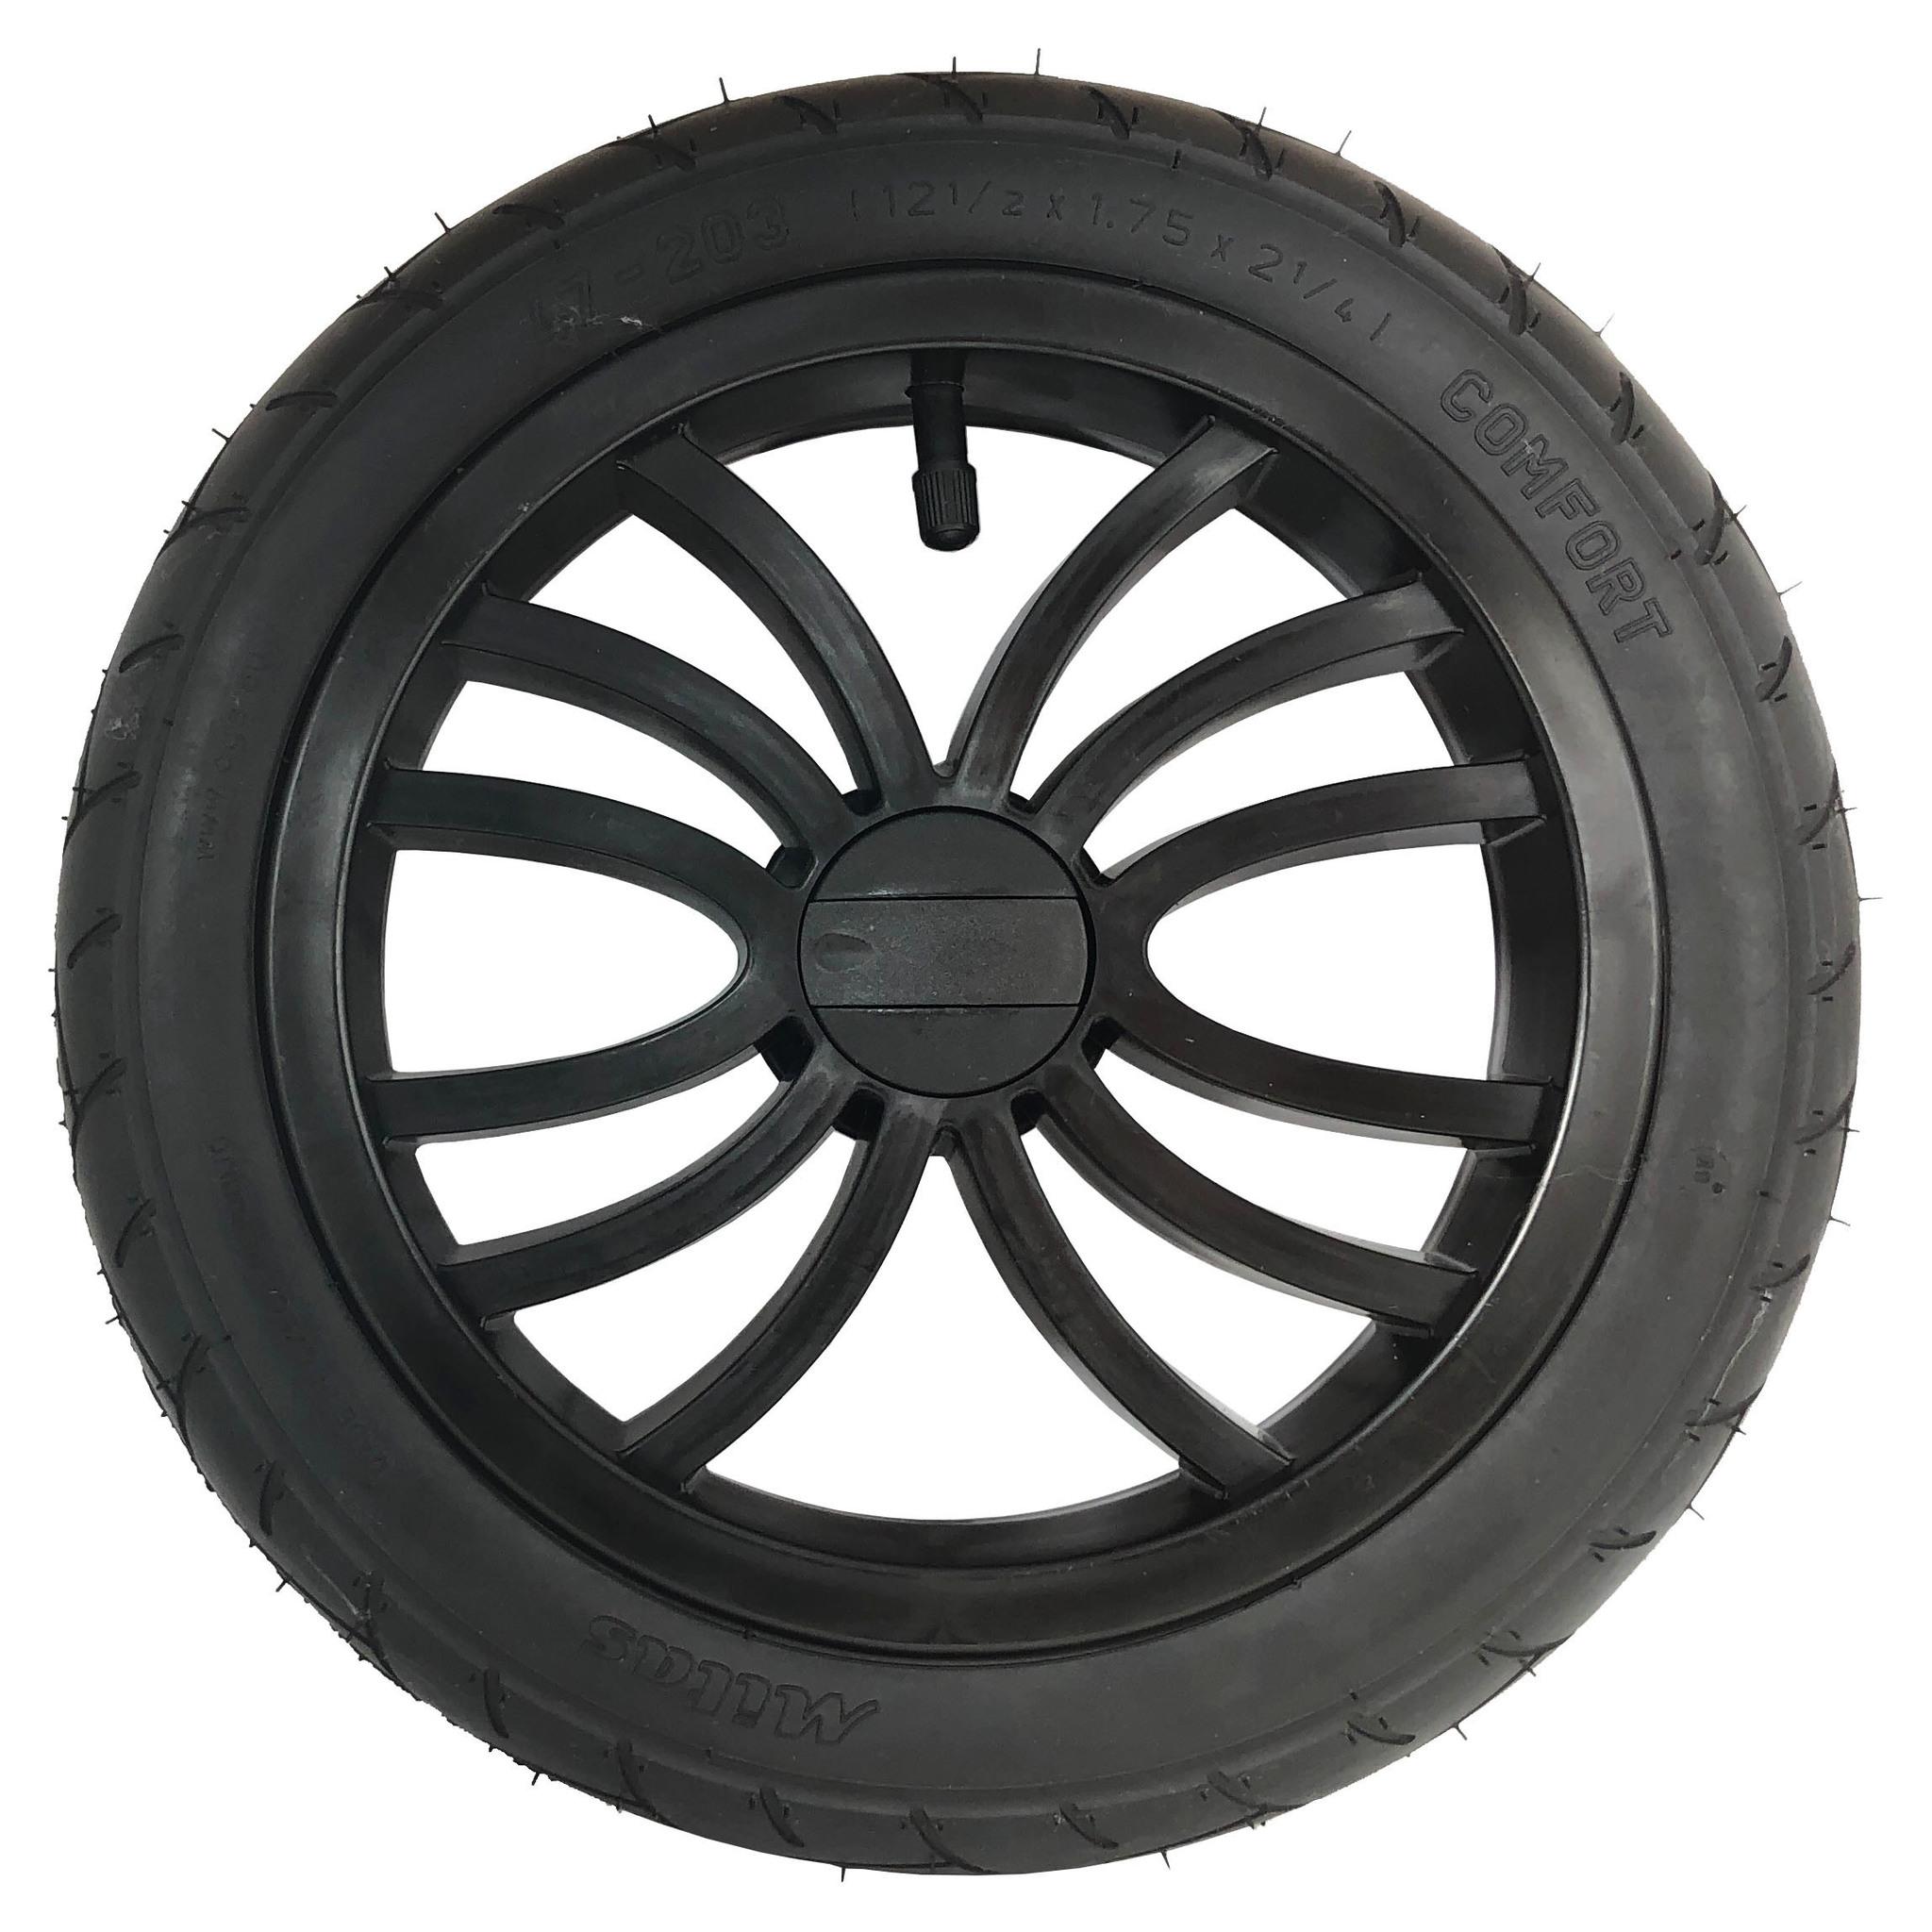 12 дюймов (30 см) Колесо для коляски Slaro 12 1/2 x 1.75 x 2 1/4 Колесо_12_луч.jpg